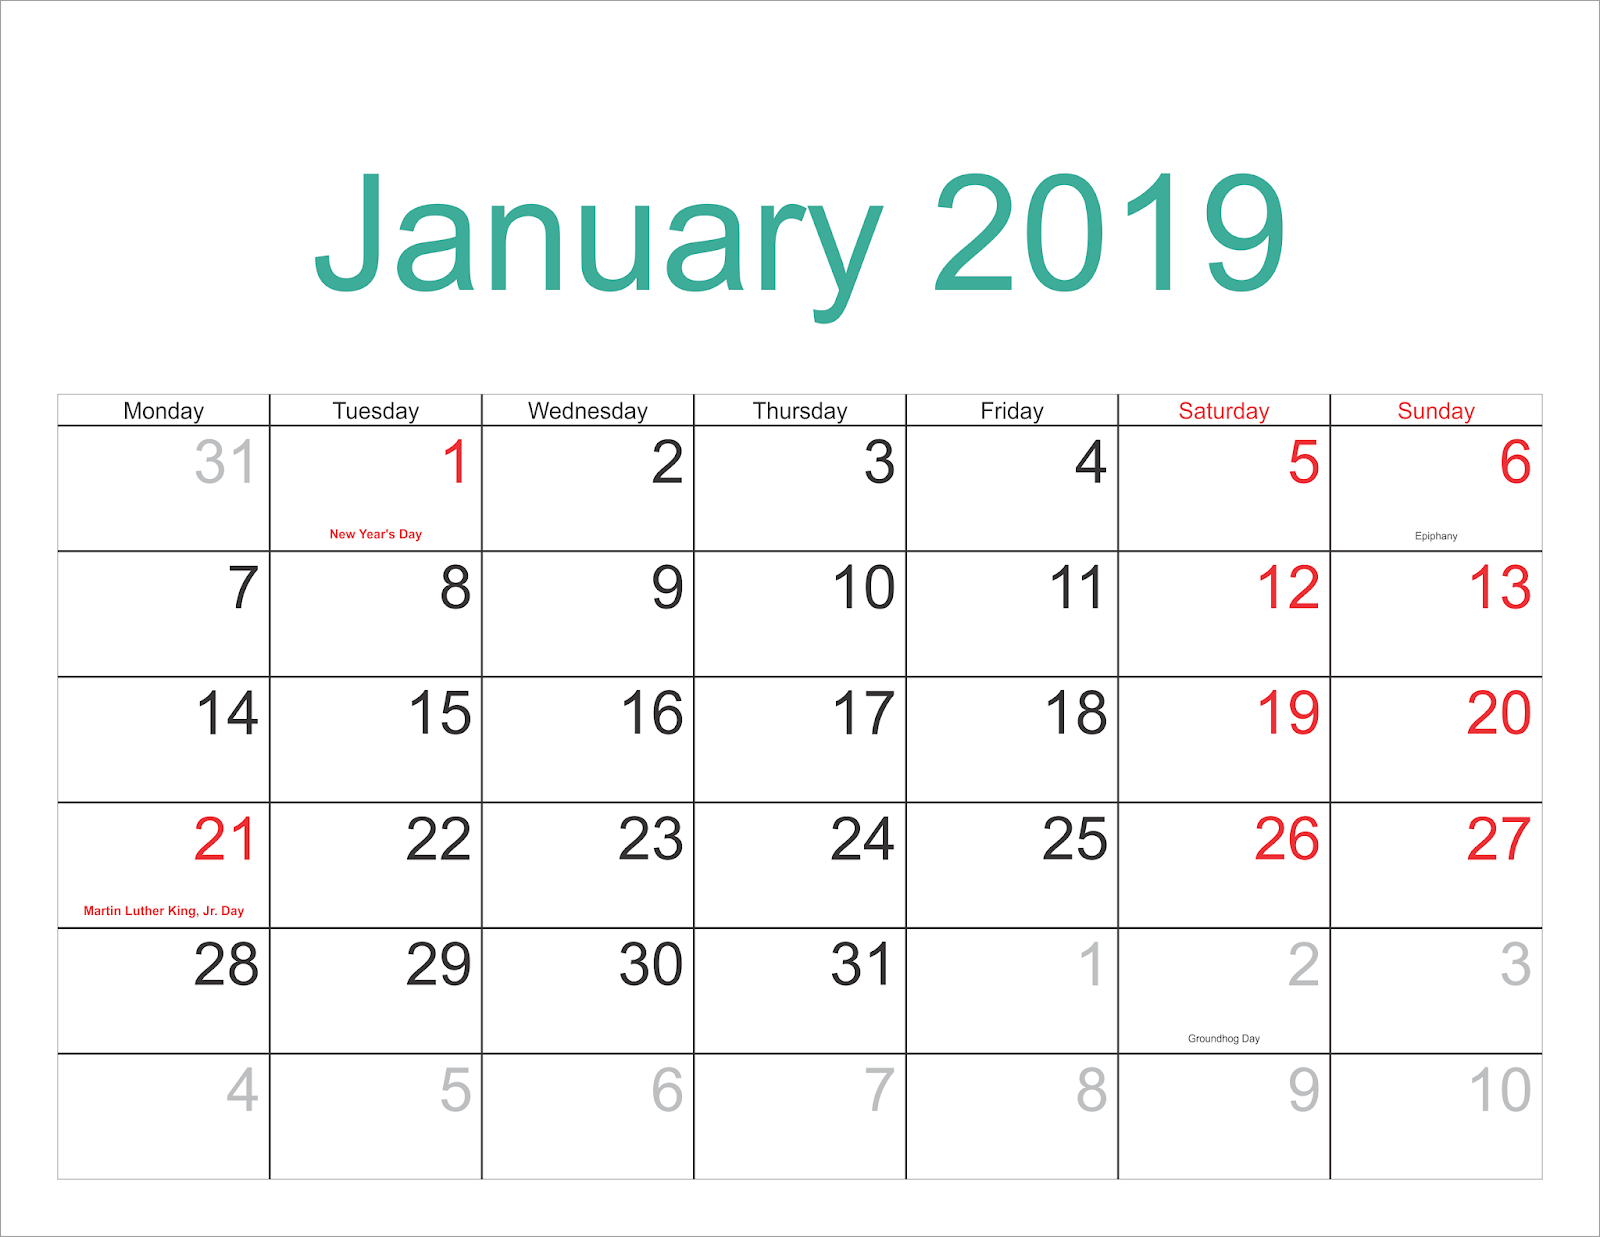 Free Download January 2019 Landscape Portrait Calendar Template